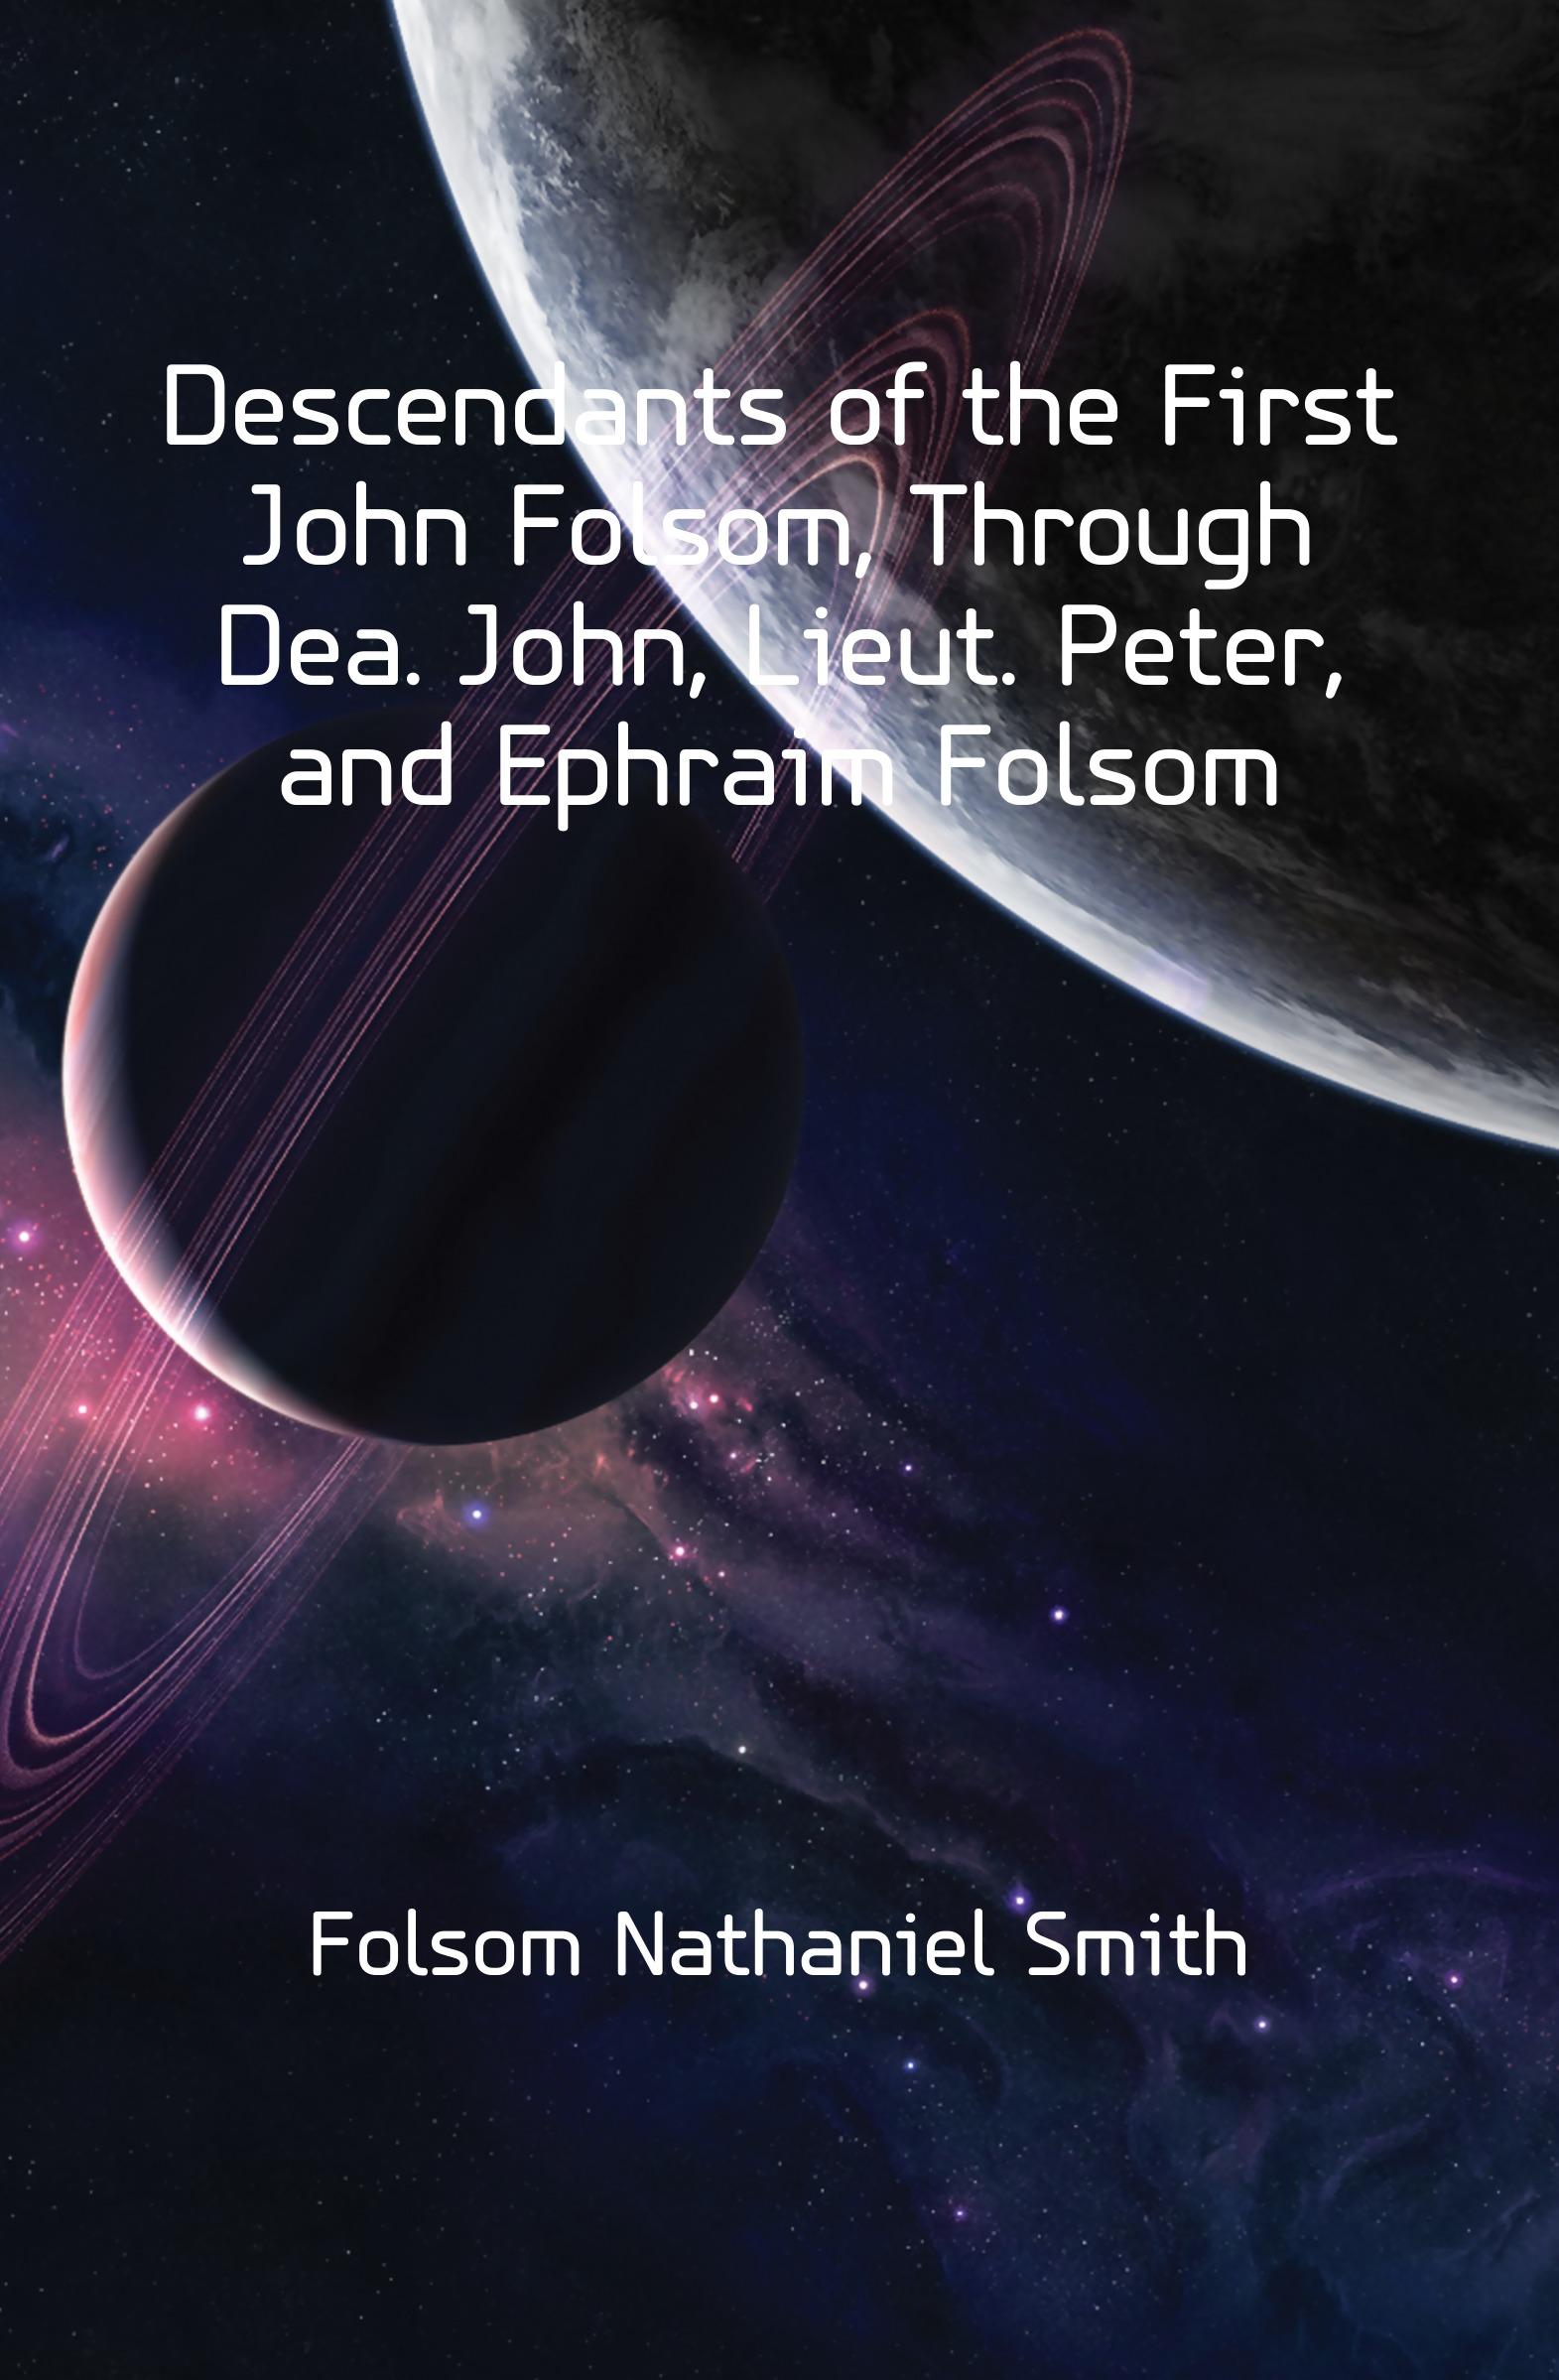 Folsom Nathaniel Smith Descendants of the First John Folsom, Through Dea. John, Lieut. Peter, and Ephraim Folsom tina folsom enticing